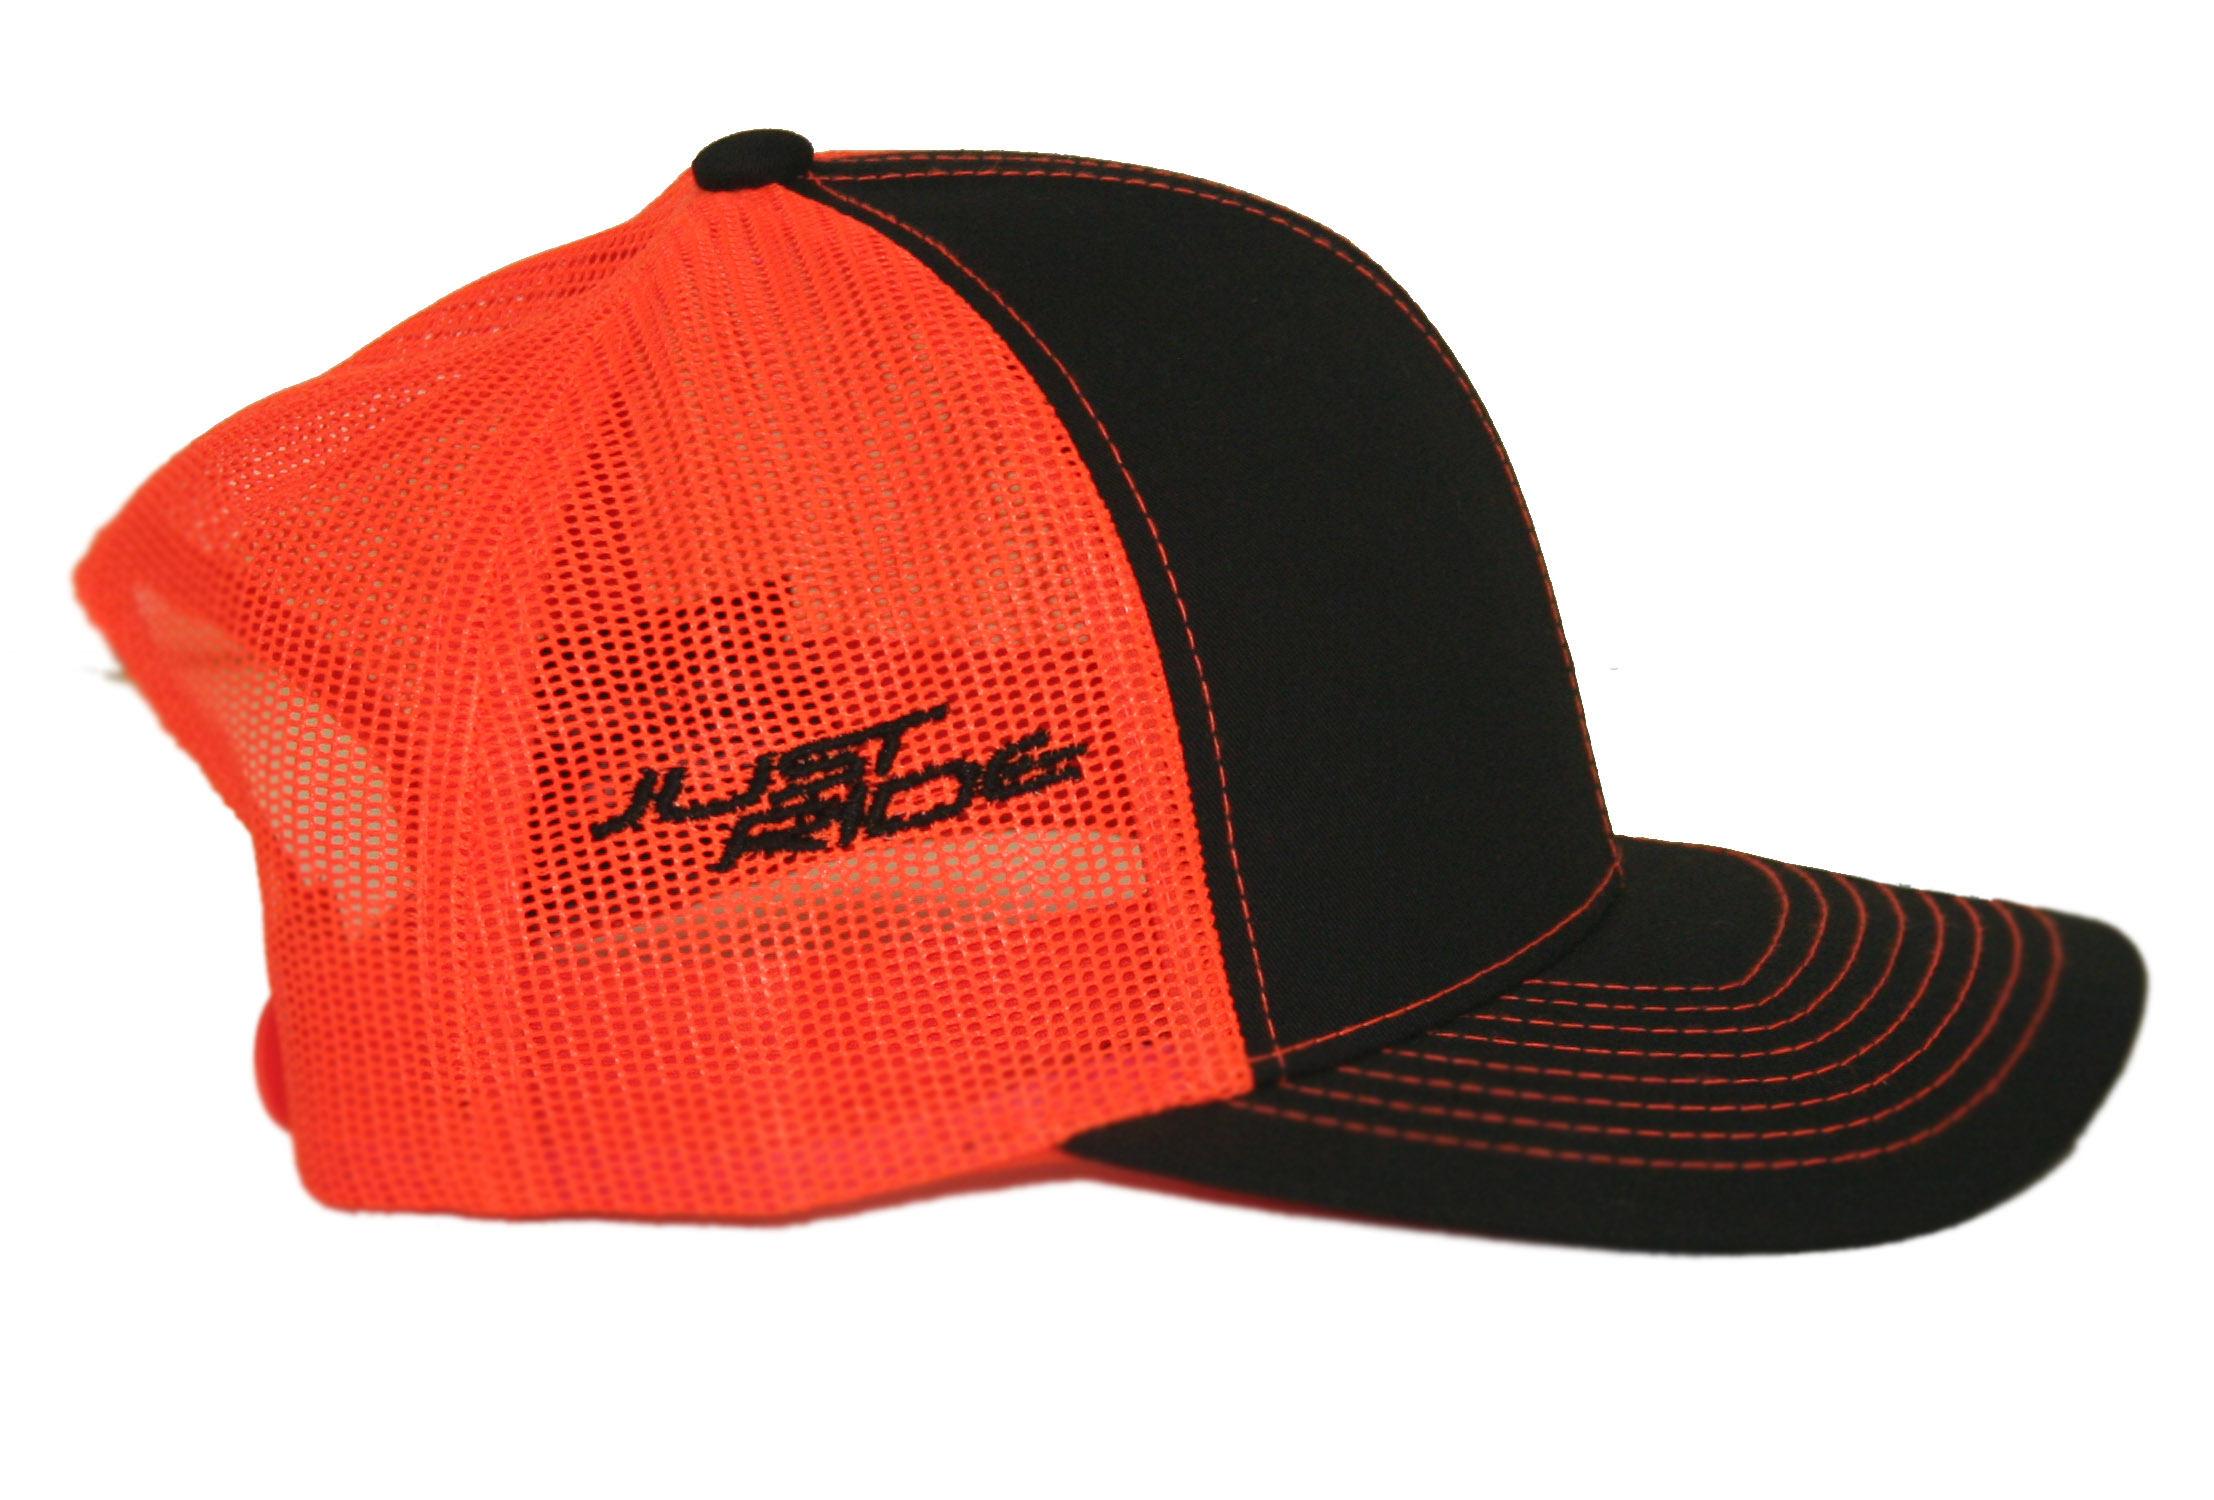 44002467641 Motocross Number Plate Hat Curved Bill Snapback Cap Moto Dirt Bike ...